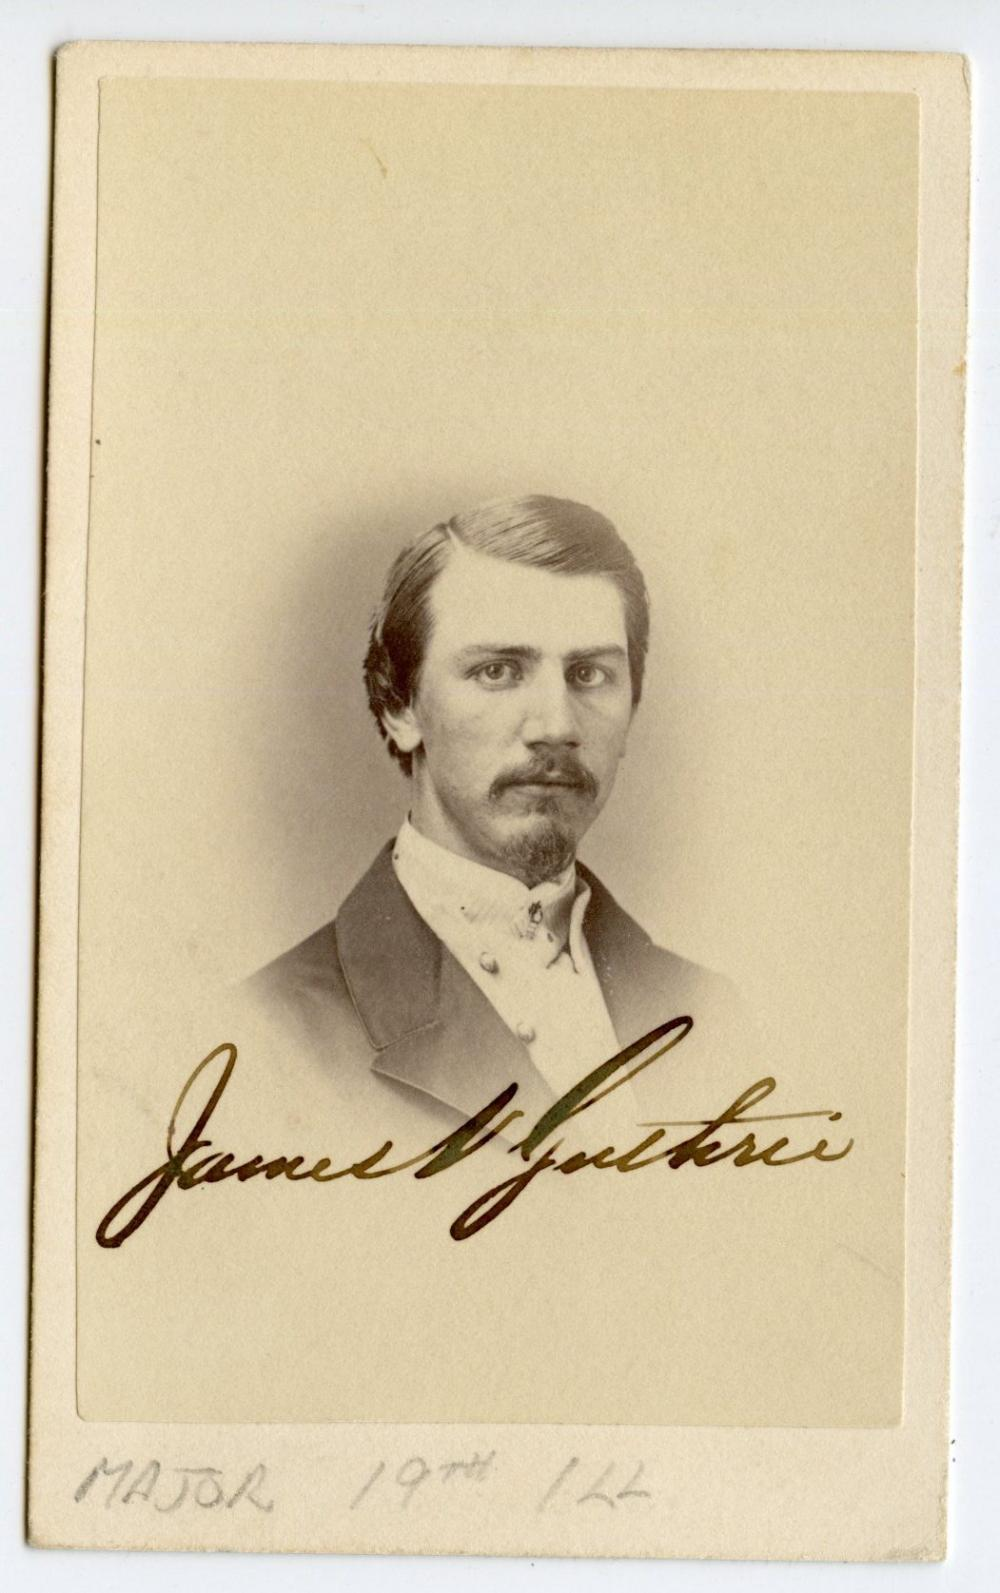 Major of the 19th Illinois, Civil War CDV